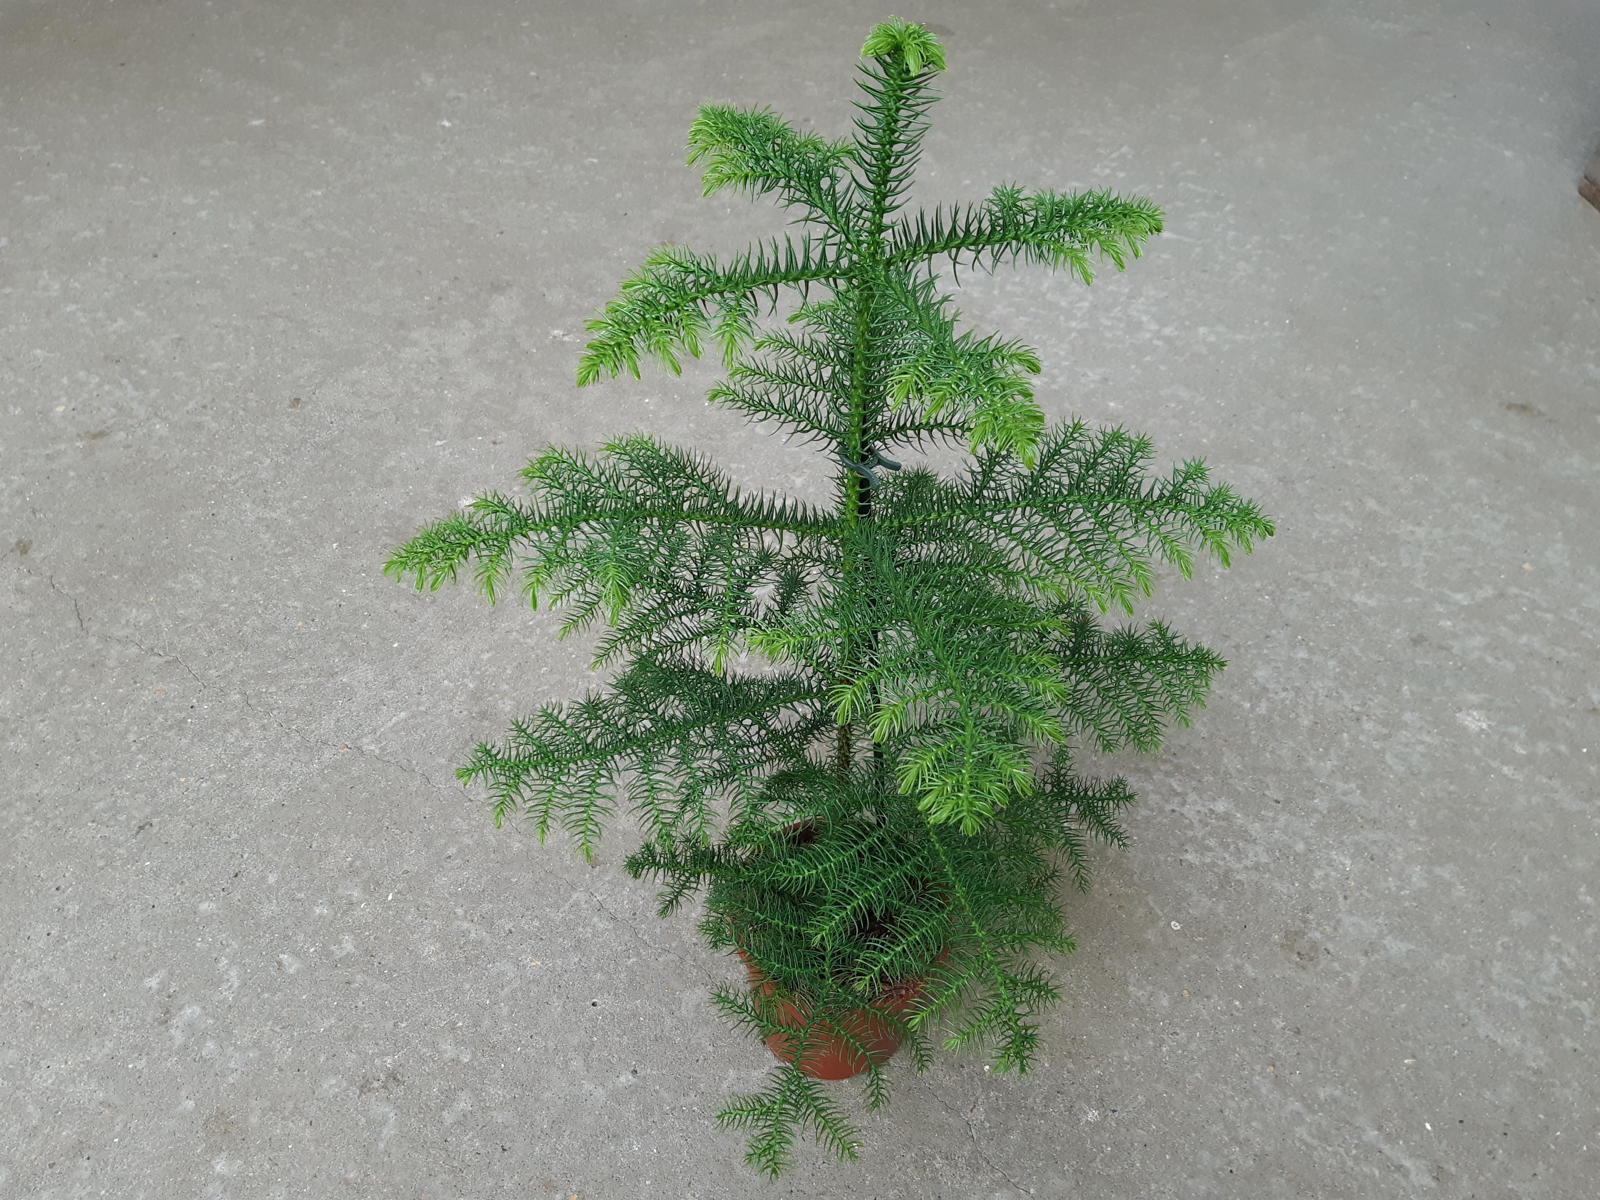 Stuegran - Araucaria heterophylla